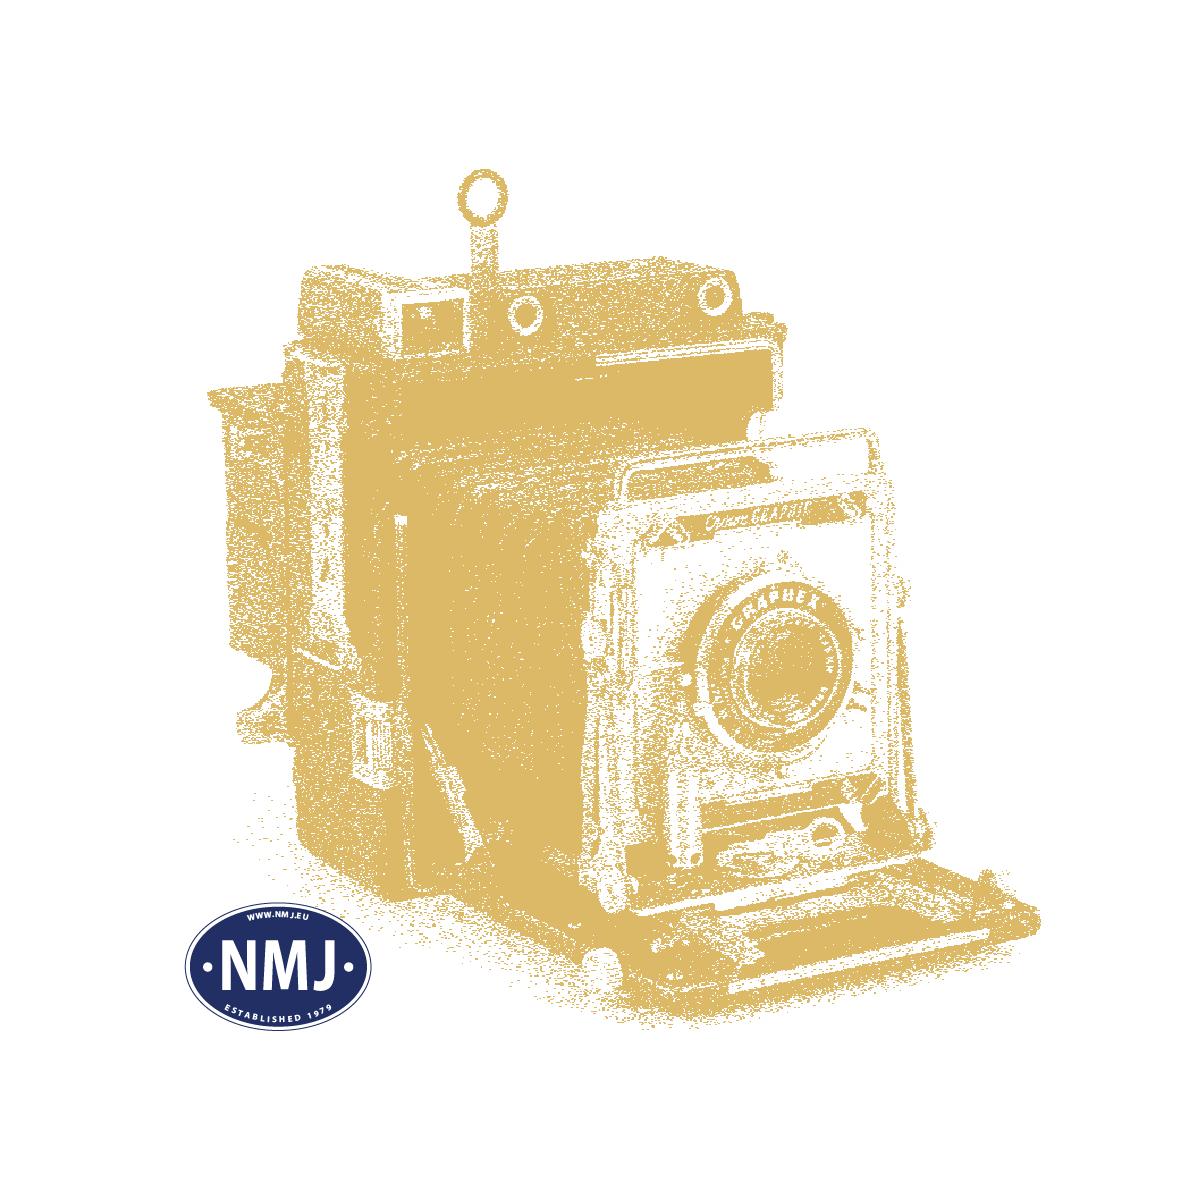 MWB-P605 - Gresstuster, 6mm, Gyllen Sommer, 21 x 15 Cm